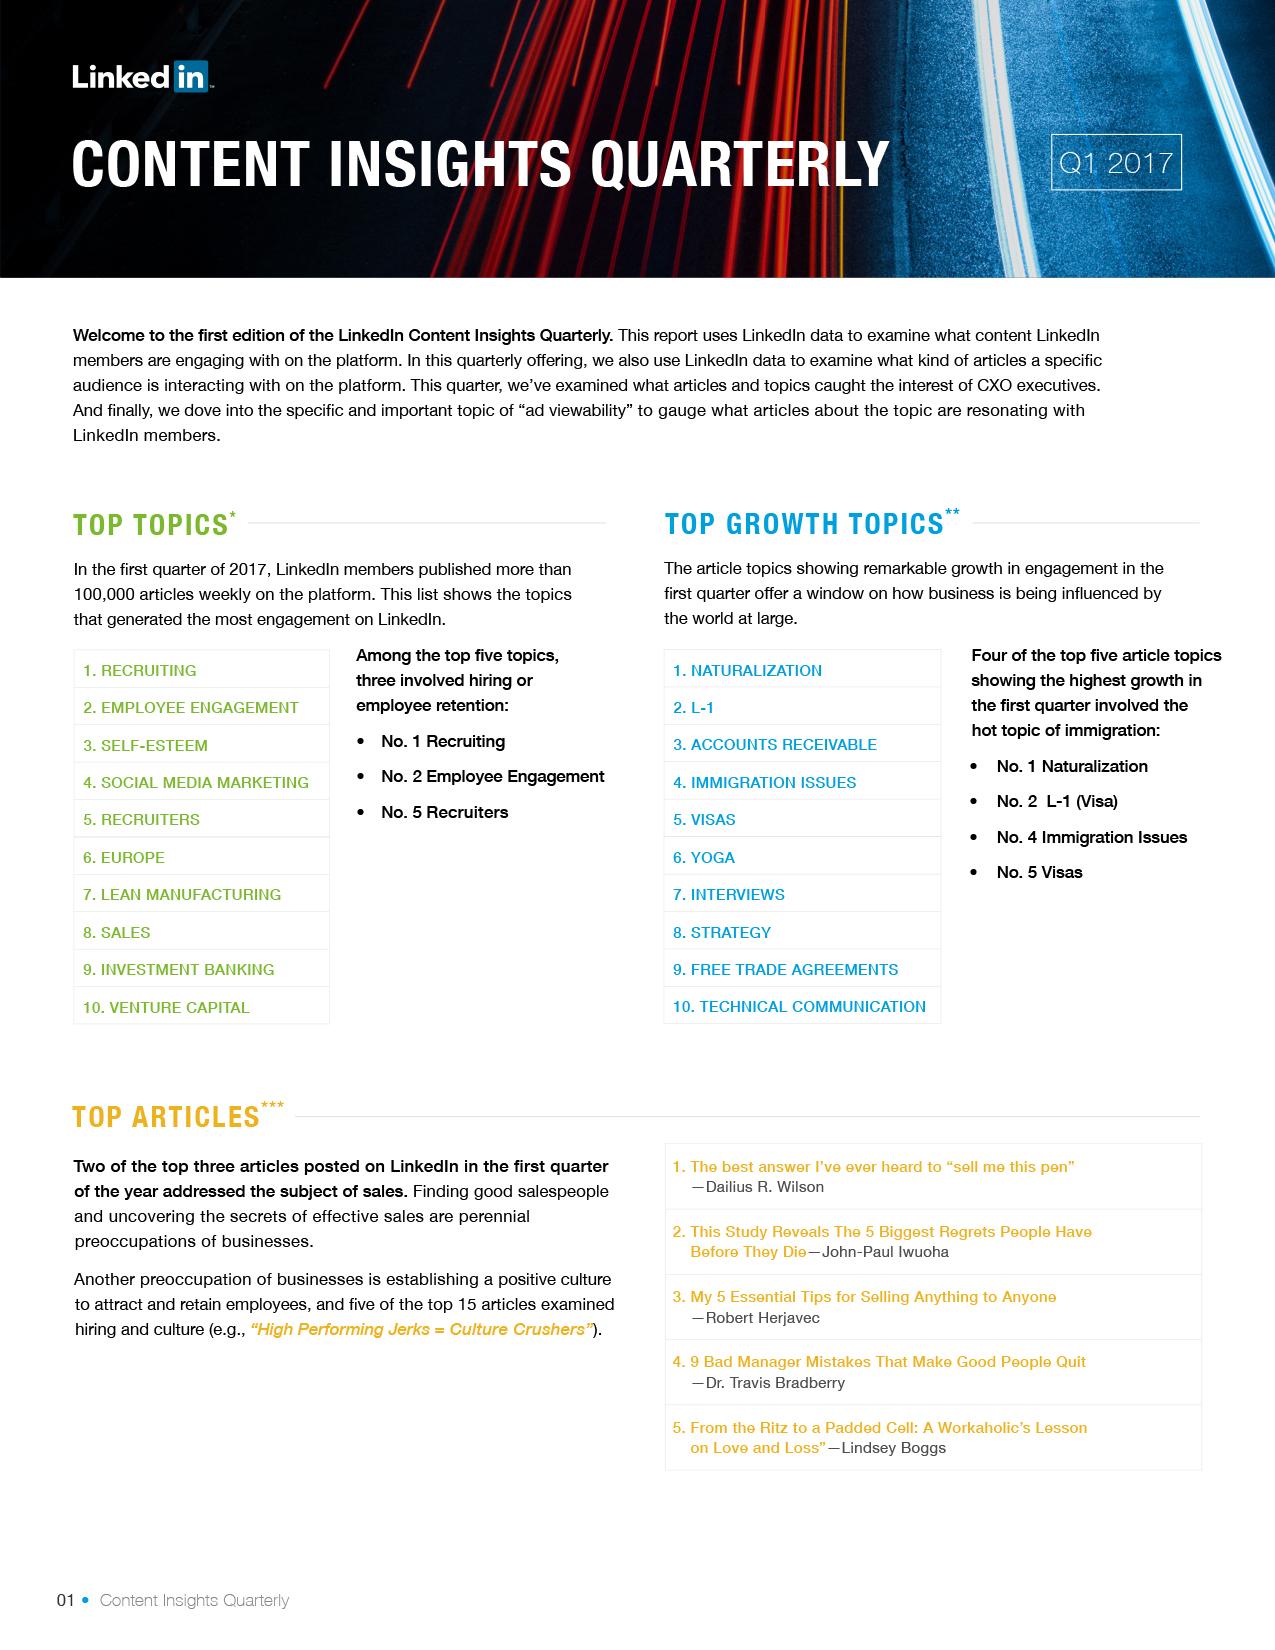 LinkedIn Content Insights Quarterly